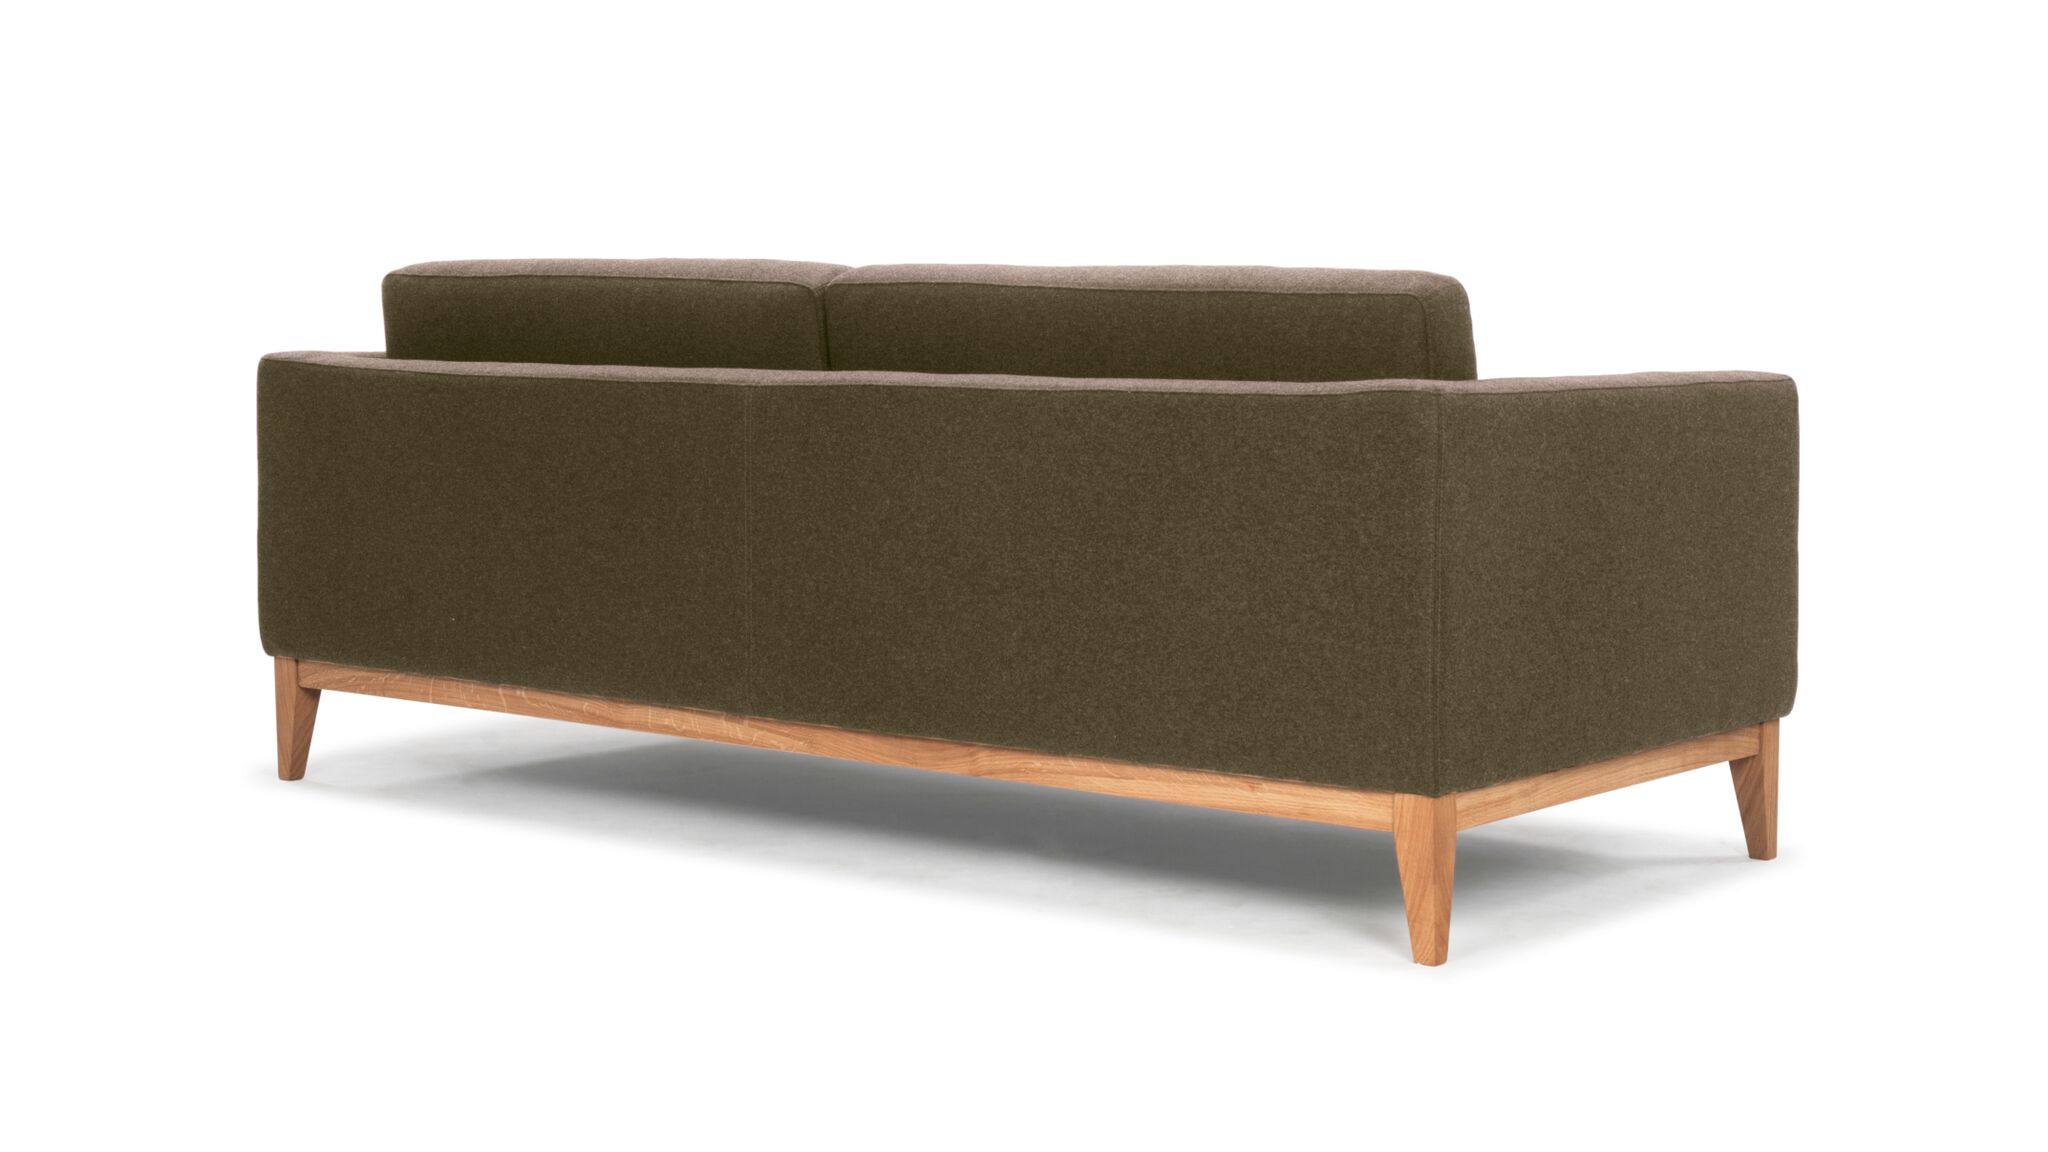 Design House Stockholm sofa Day Army melange Newformsdesign